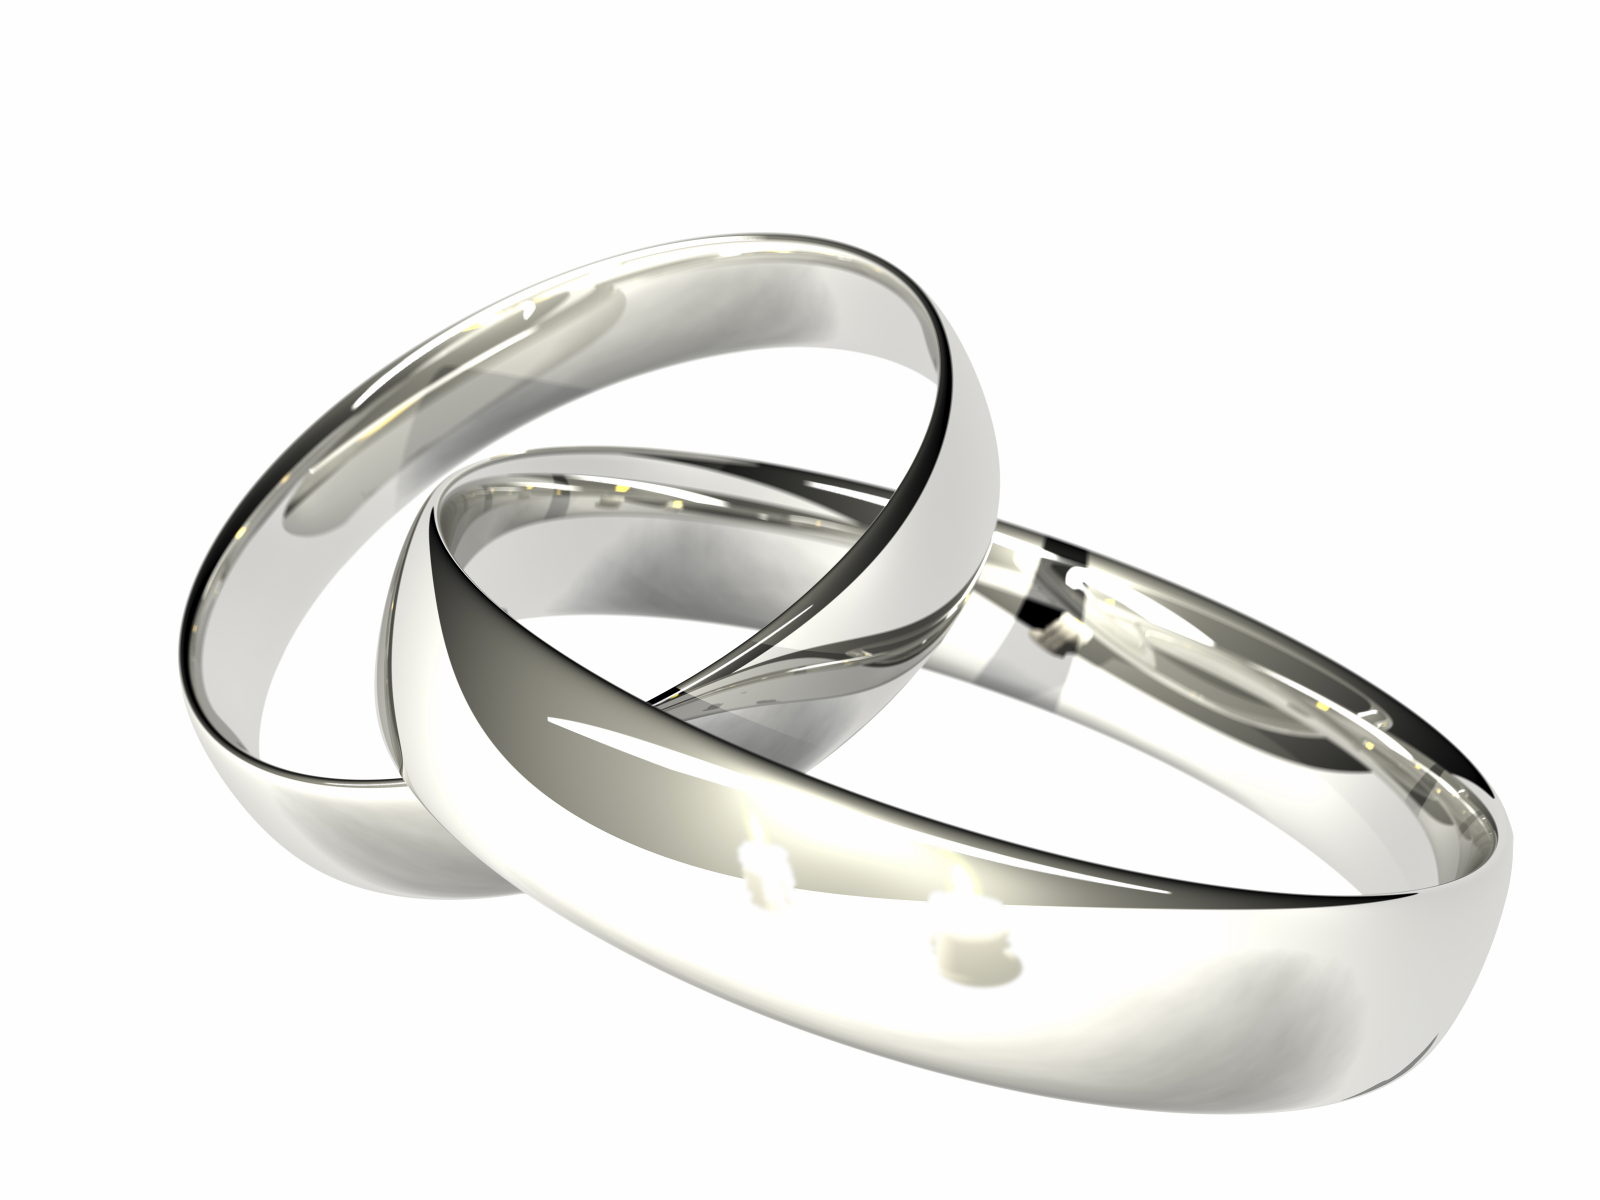 Interlocking Wedding Rings Clipart Luxury Wedding Rings.